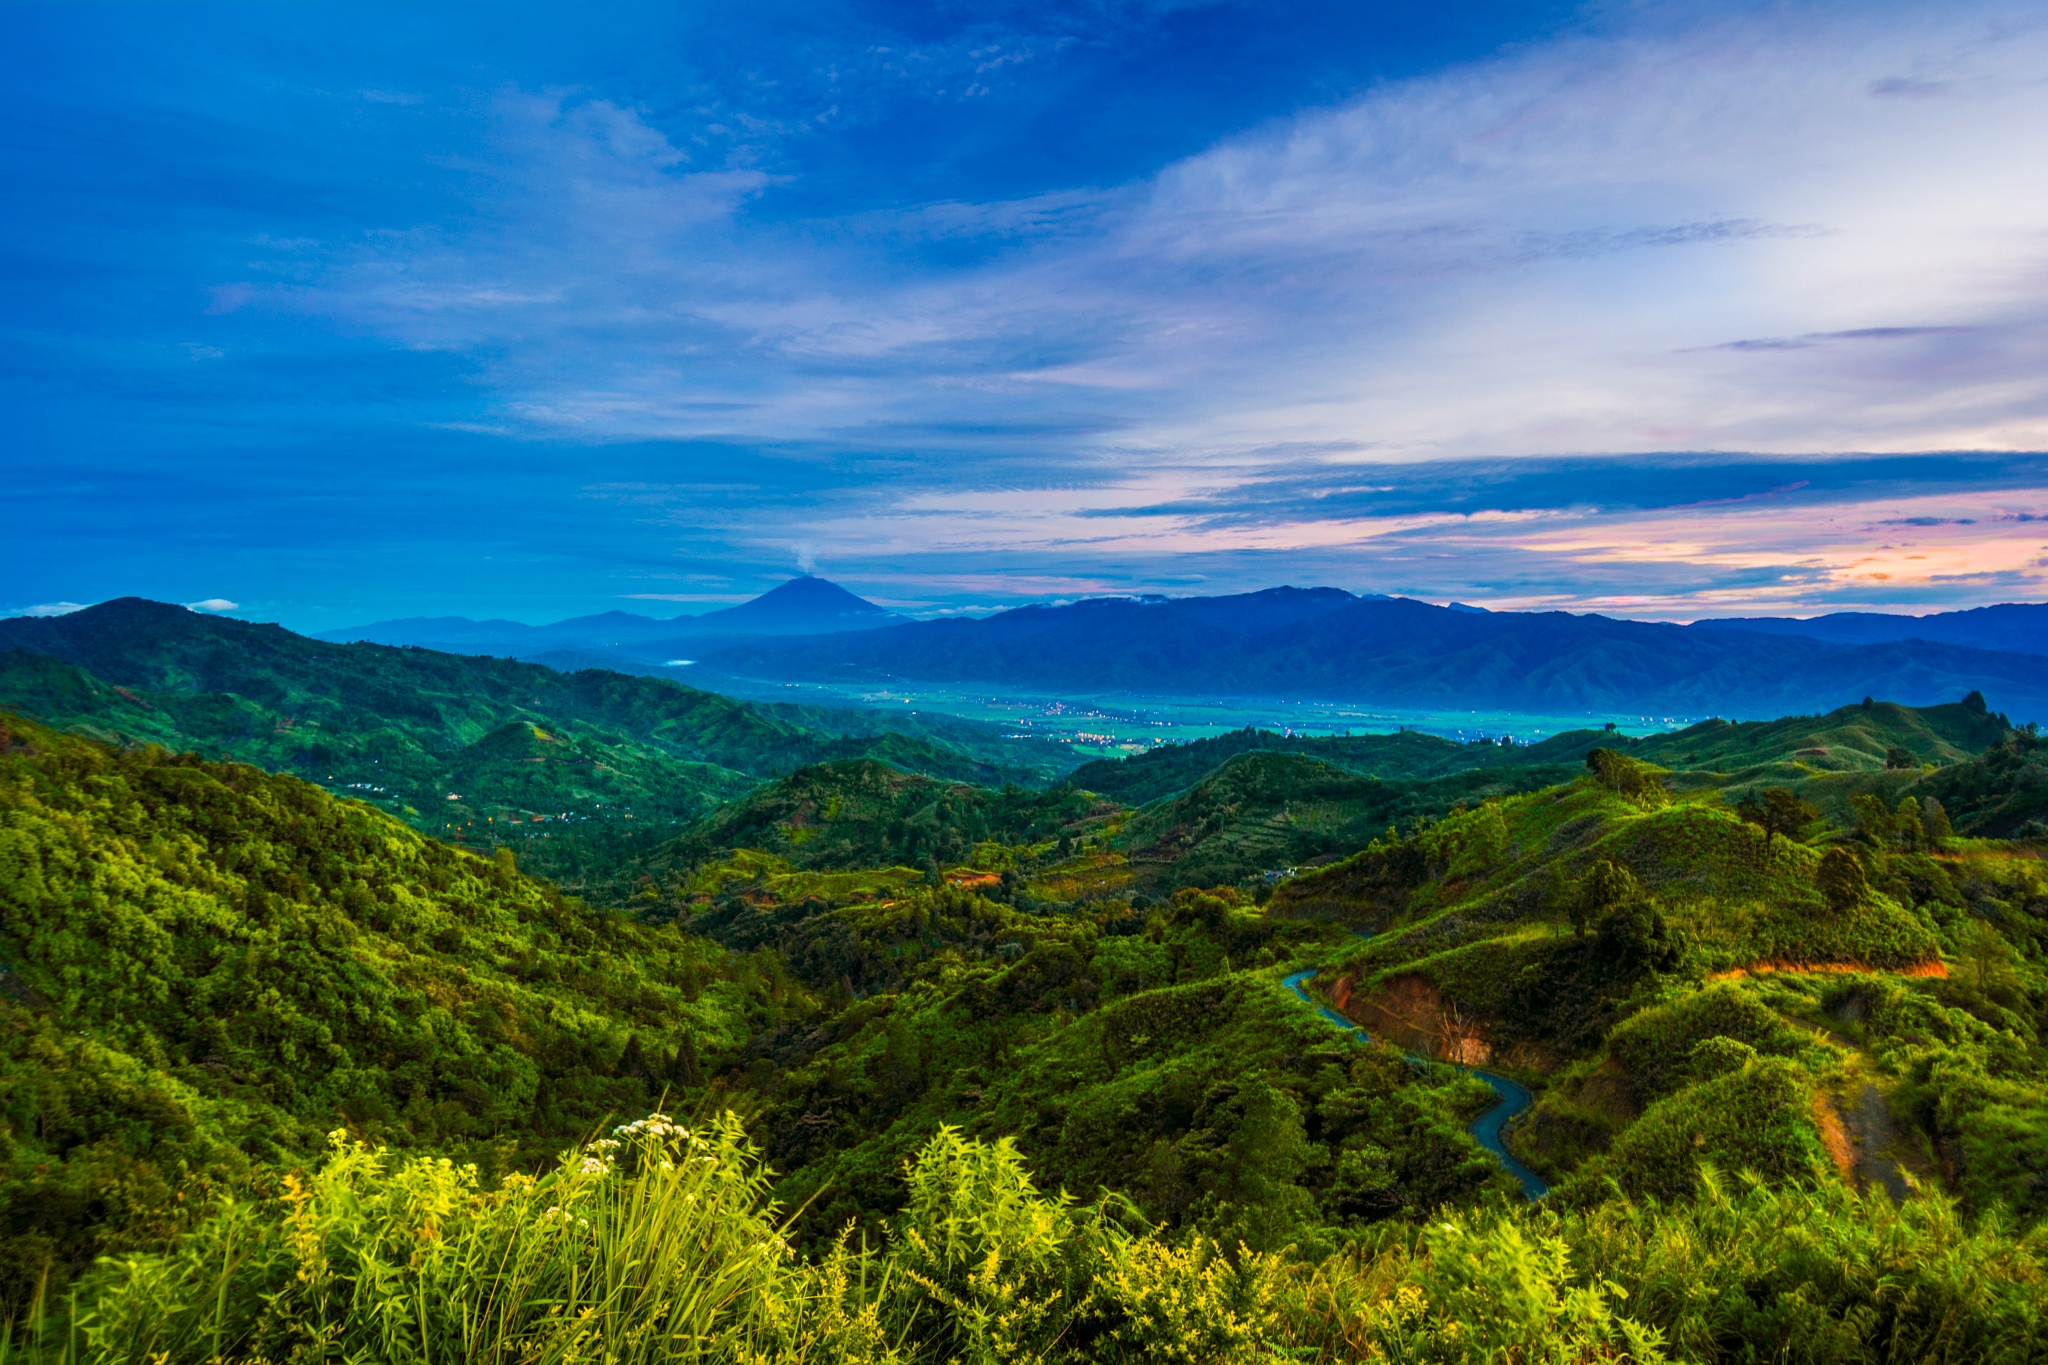 Somewhere in Sumatera by Akmal Luthfi M